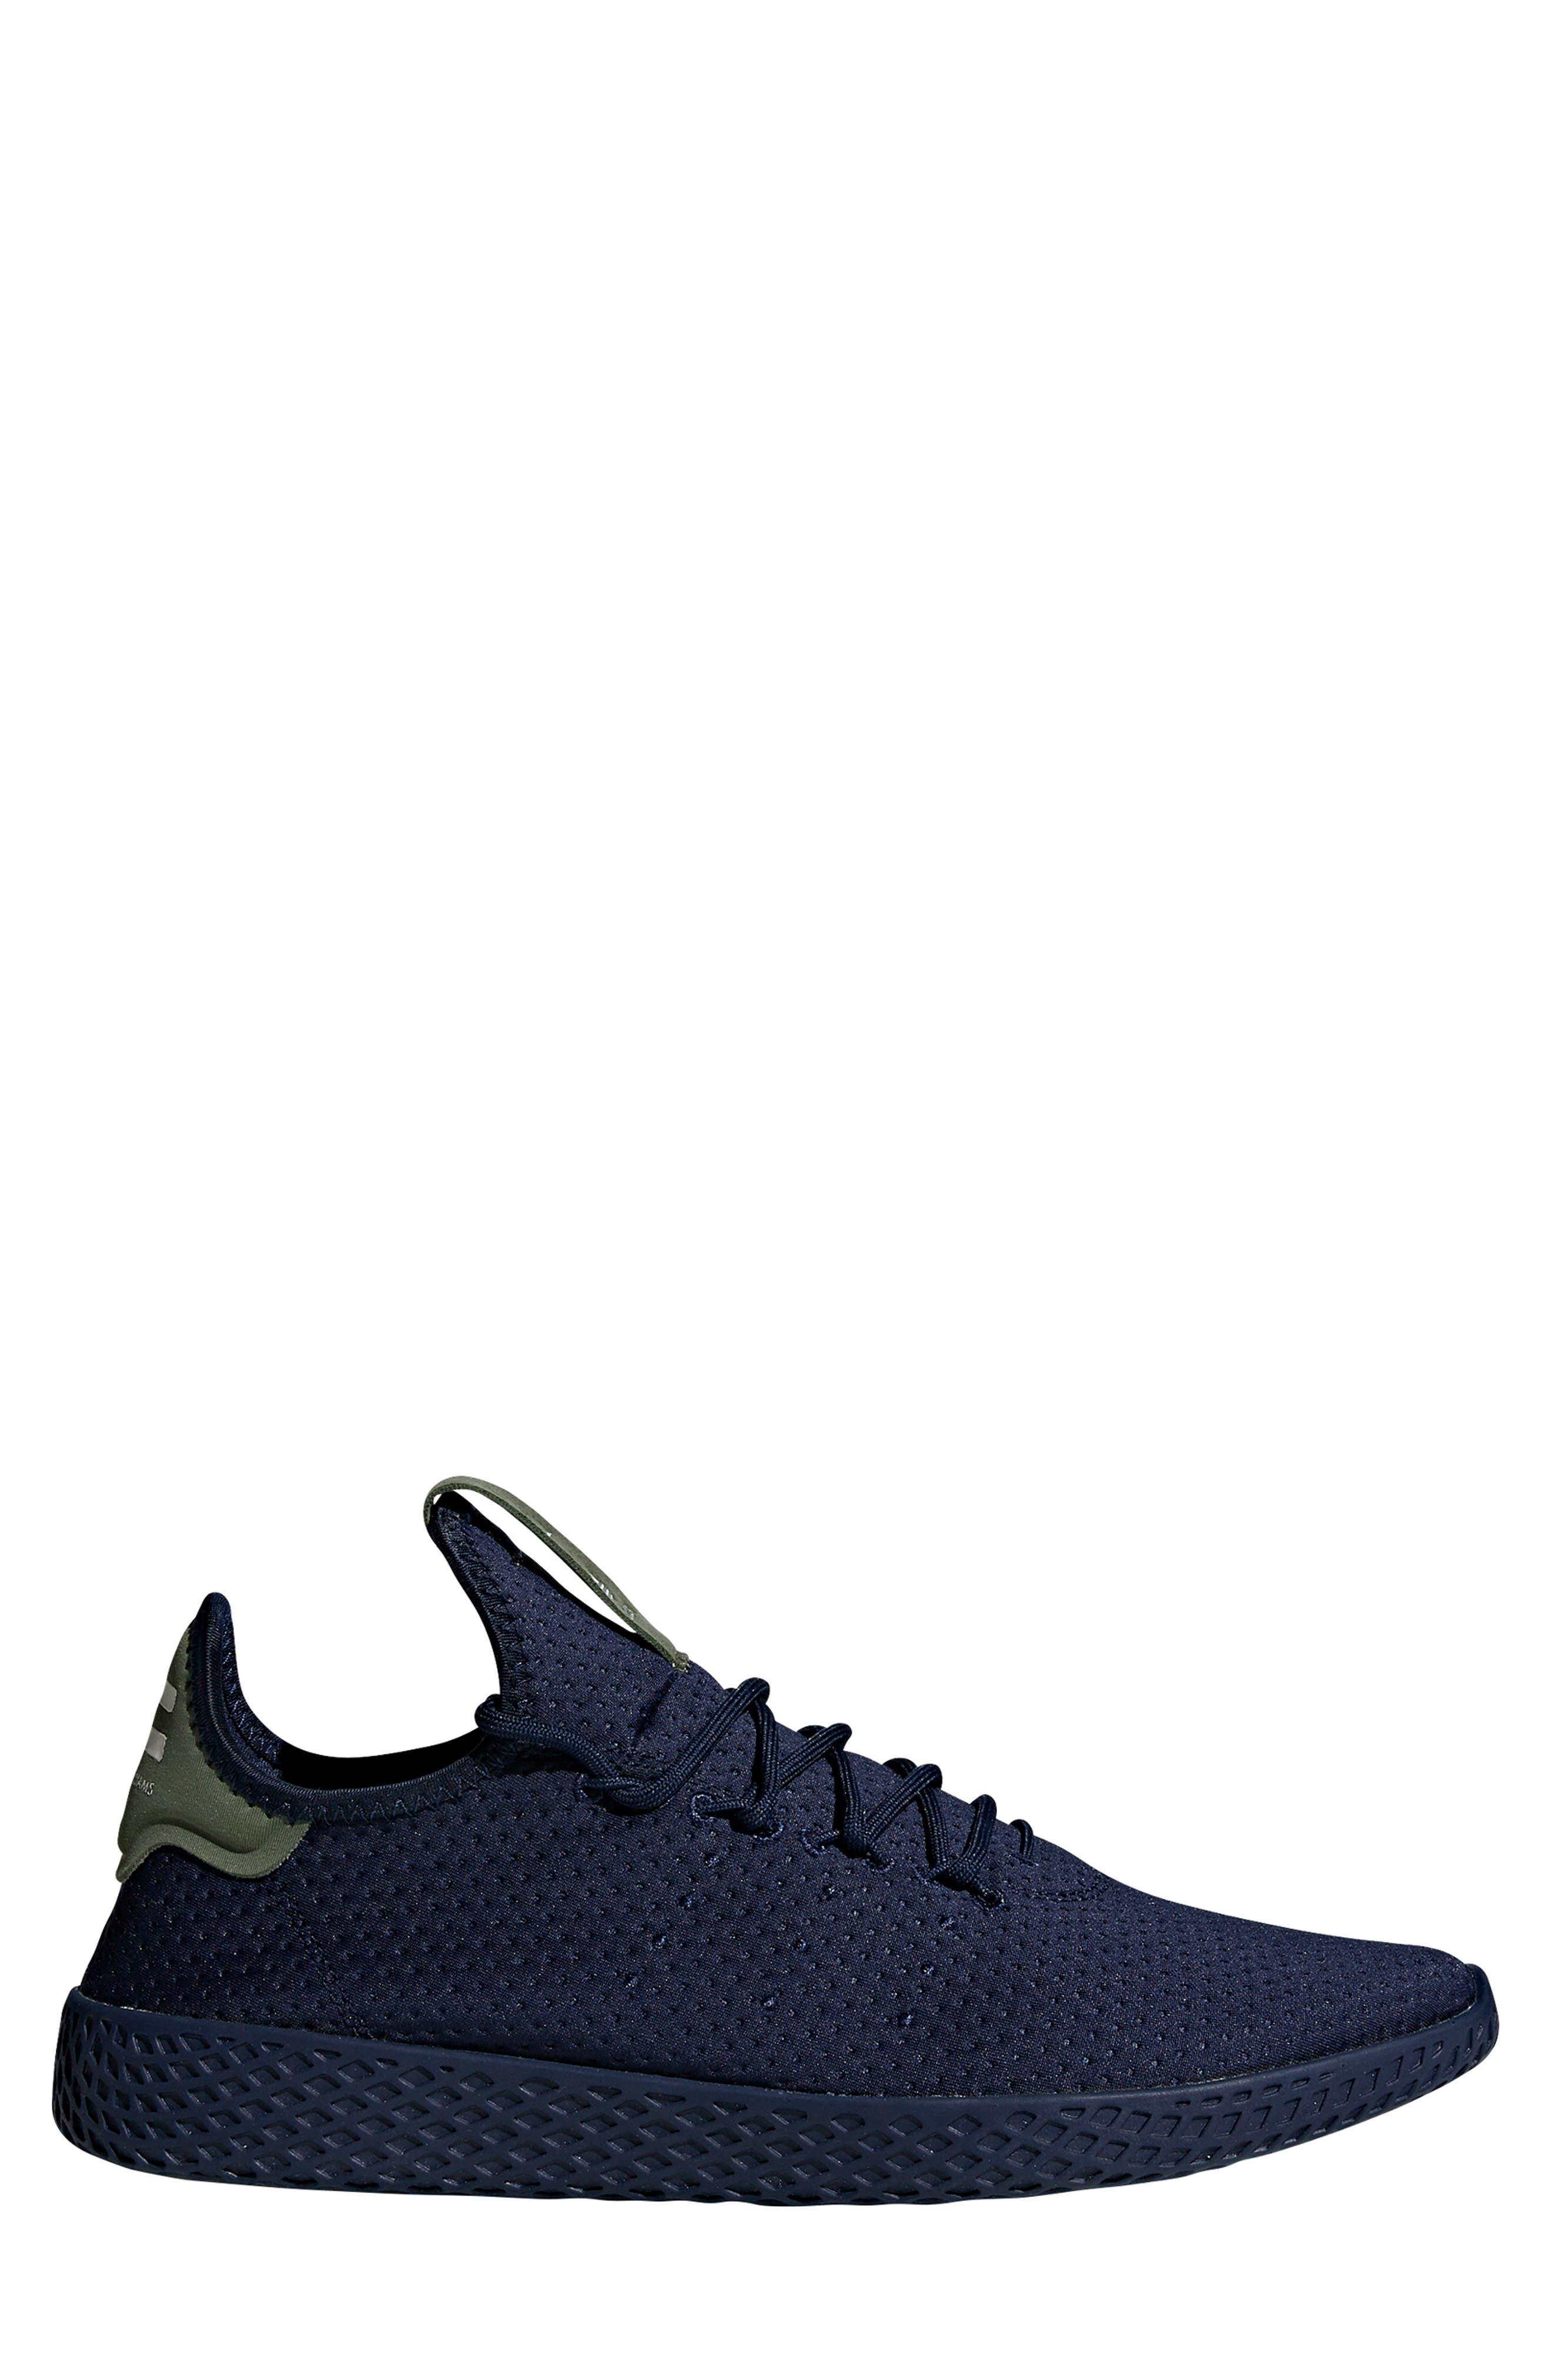 Pharrell Williams Tennis Hu Sneaker,                             Alternate thumbnail 3, color,                             415